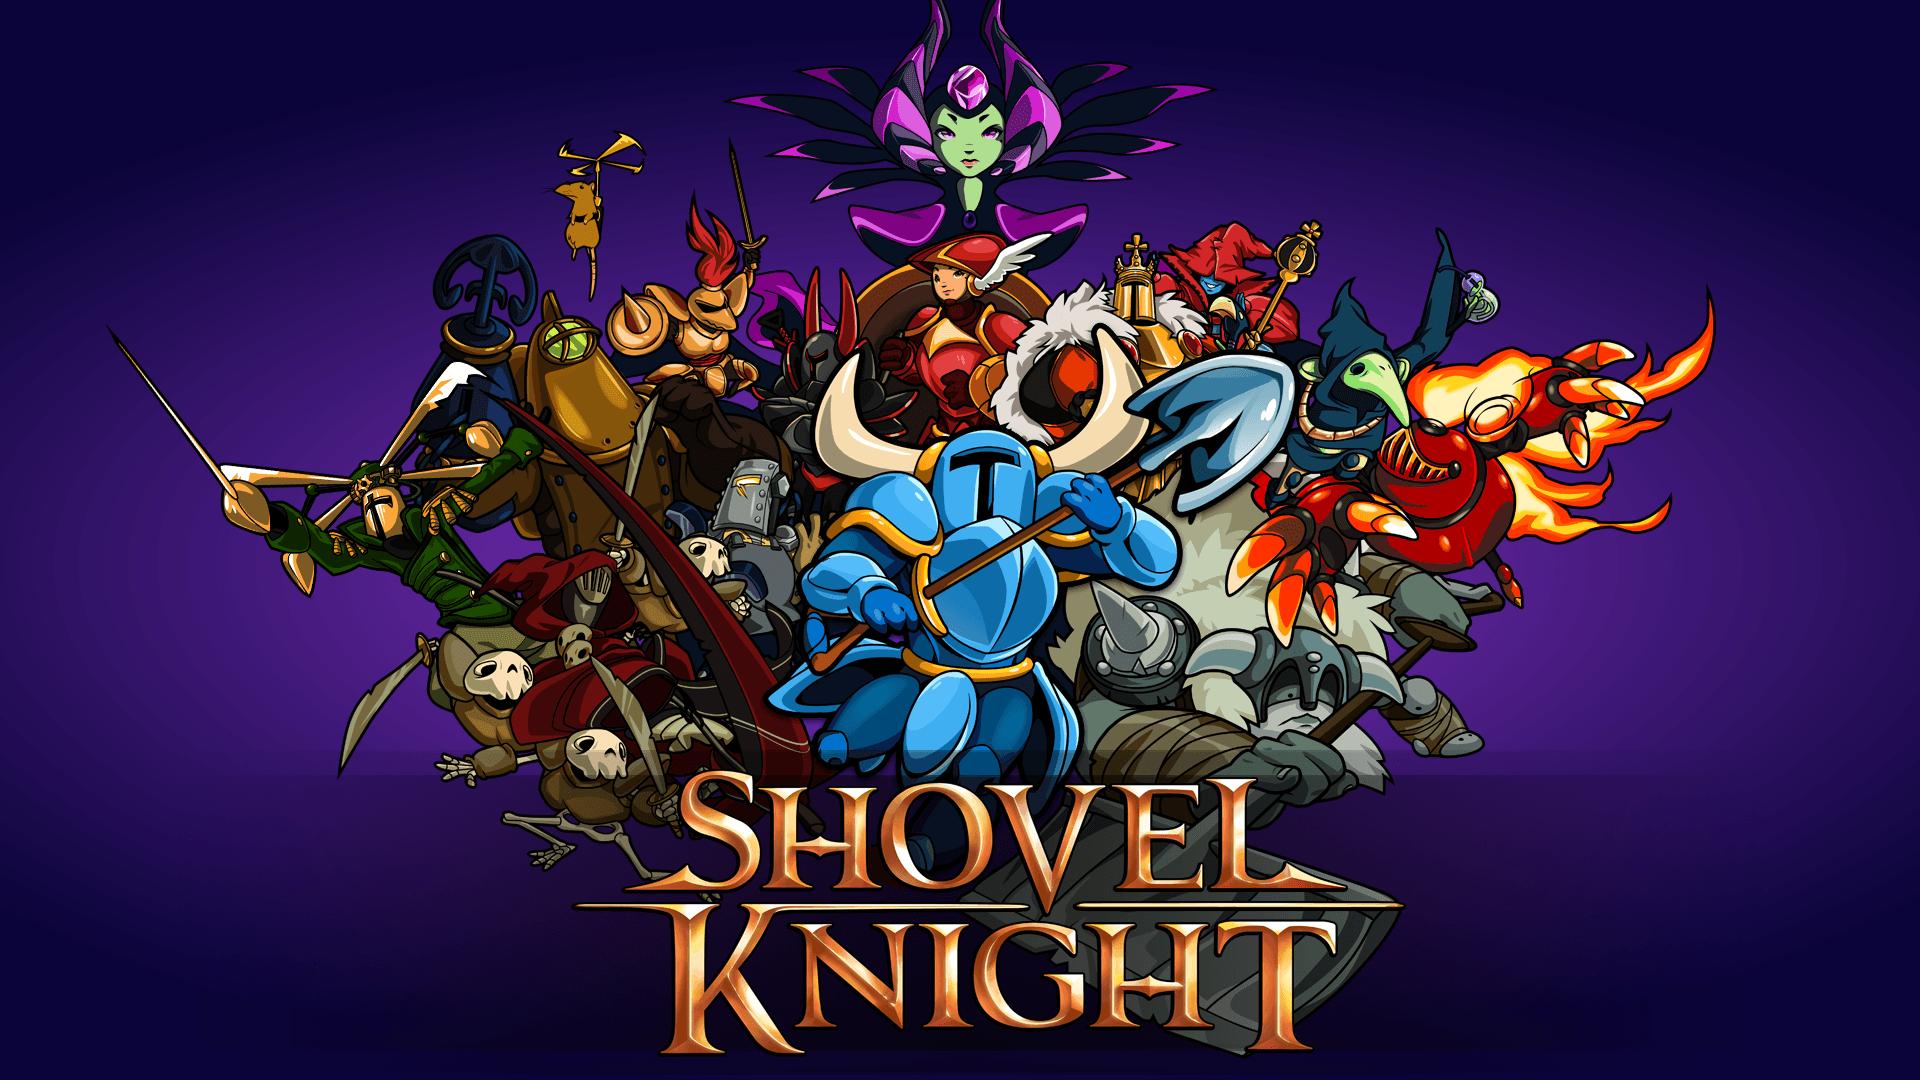 Shovel Knight Wallpapers Wallpaper Cave